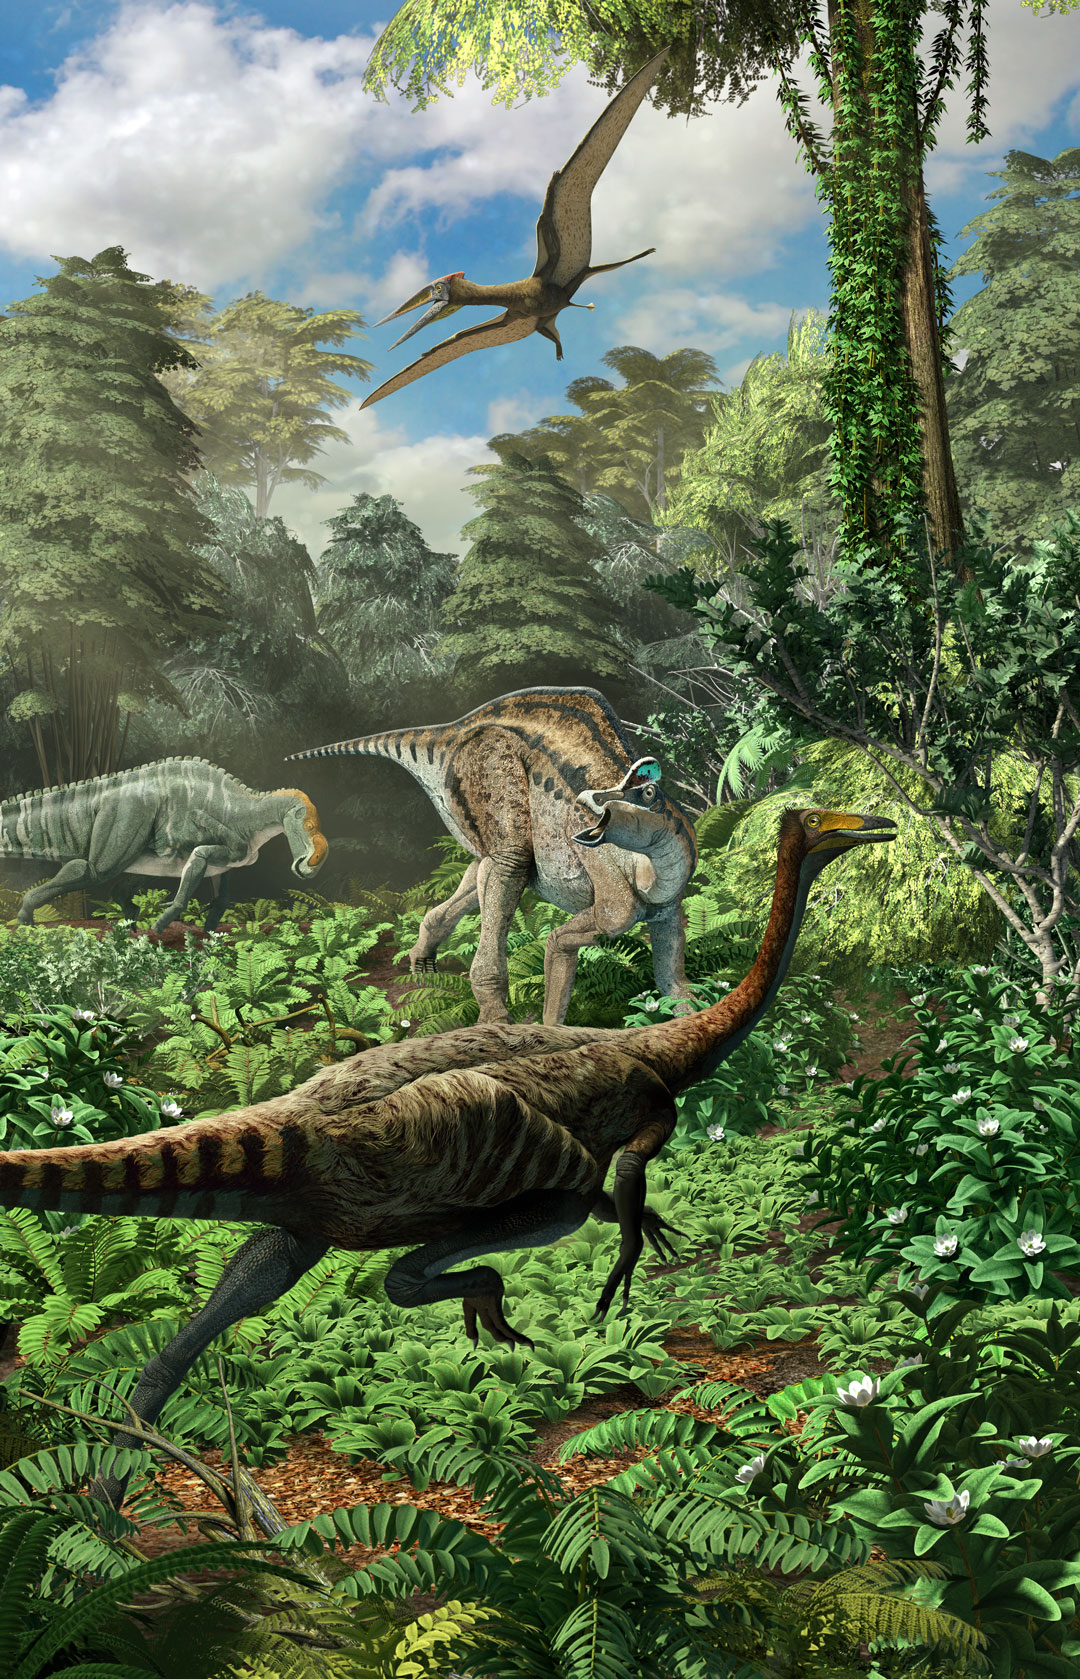 Coahuila Dinosaurs, Mexico Desconocido Magazine. Diorama detail, Saltillomimus, Velafrons and Lathirhinus. Art by Román García Mora.